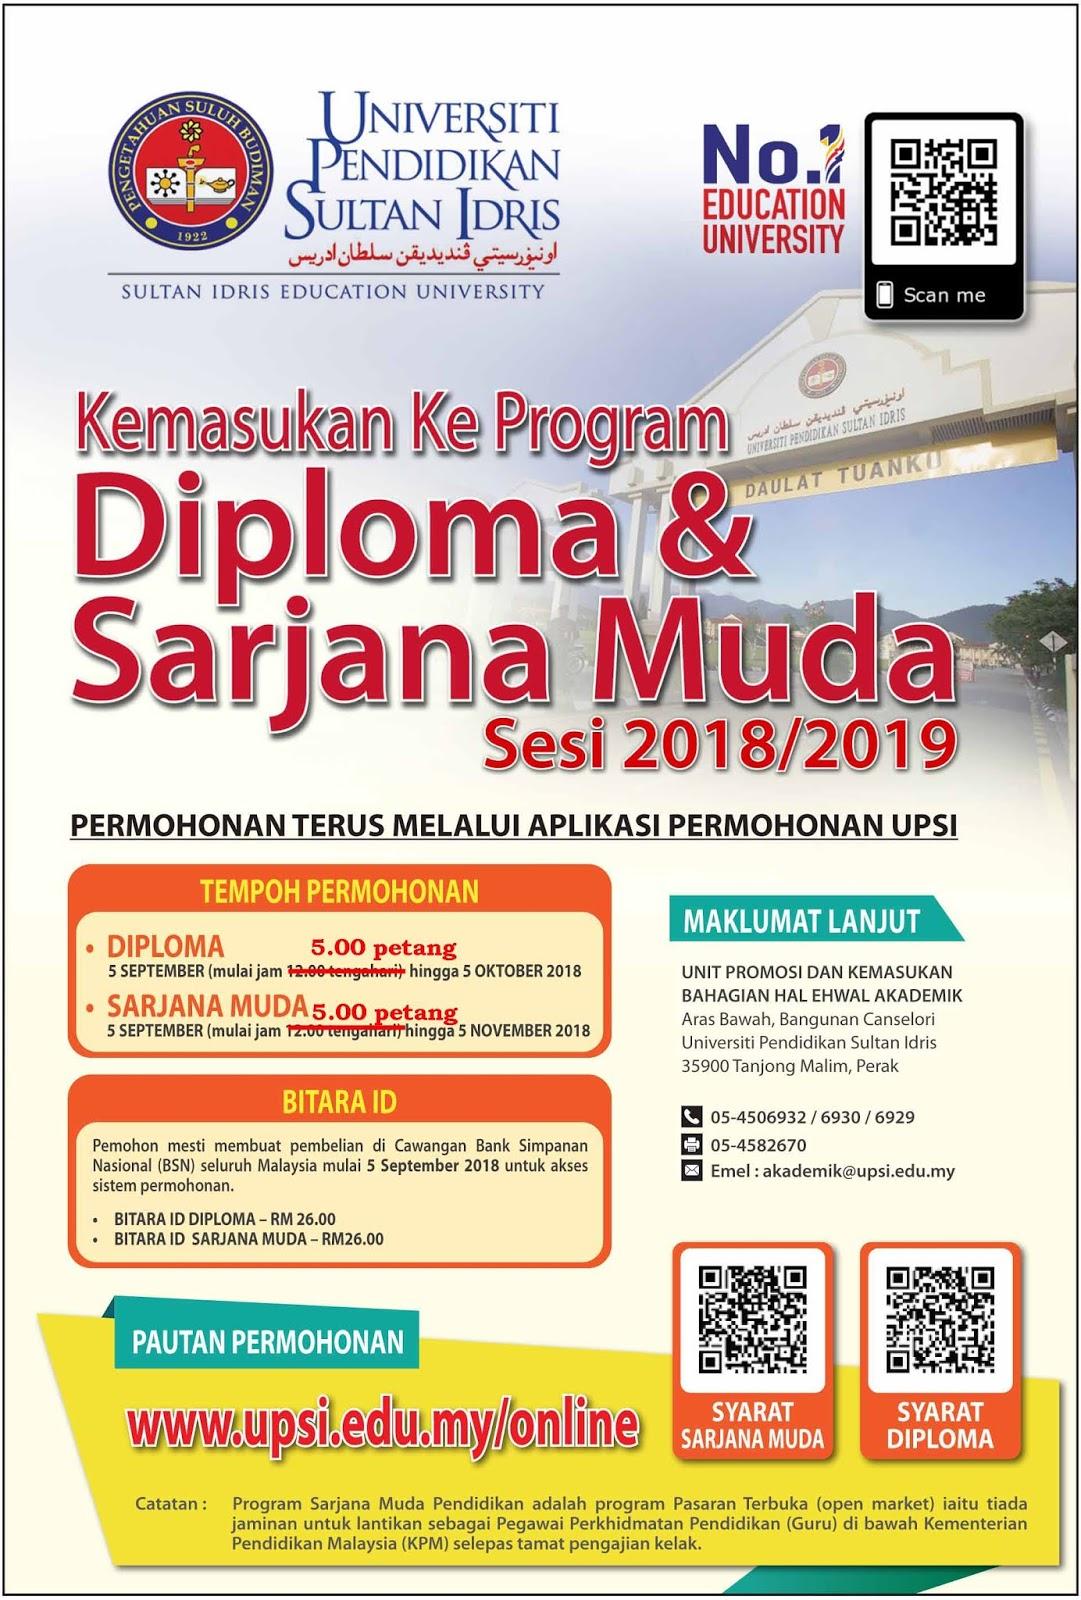 The Edvisor Malaysia Permohonan Upsi Kemasukan Sesi Akademik 2 2018 2019 Lepasan Spm Setaraf Stpm Setaraf